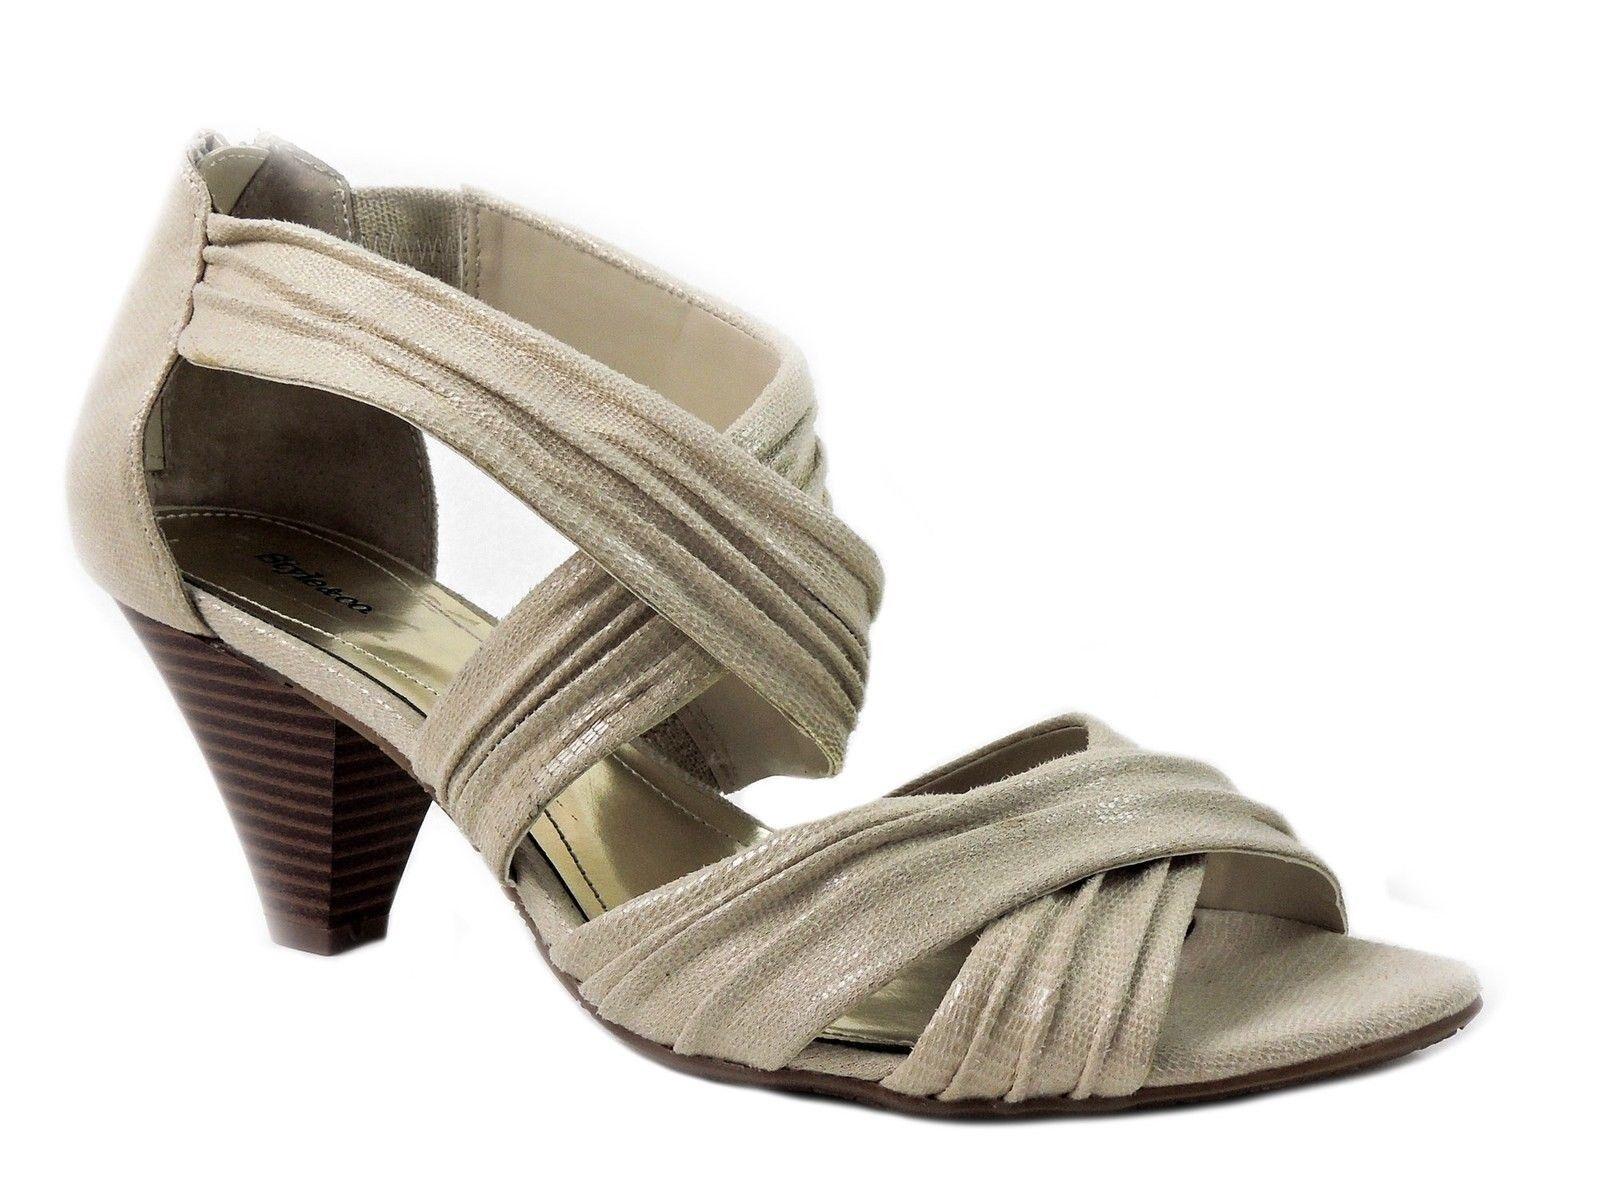 Style&co. Women's Merivale Strappy Sandals Khaki Beige Size 10 M